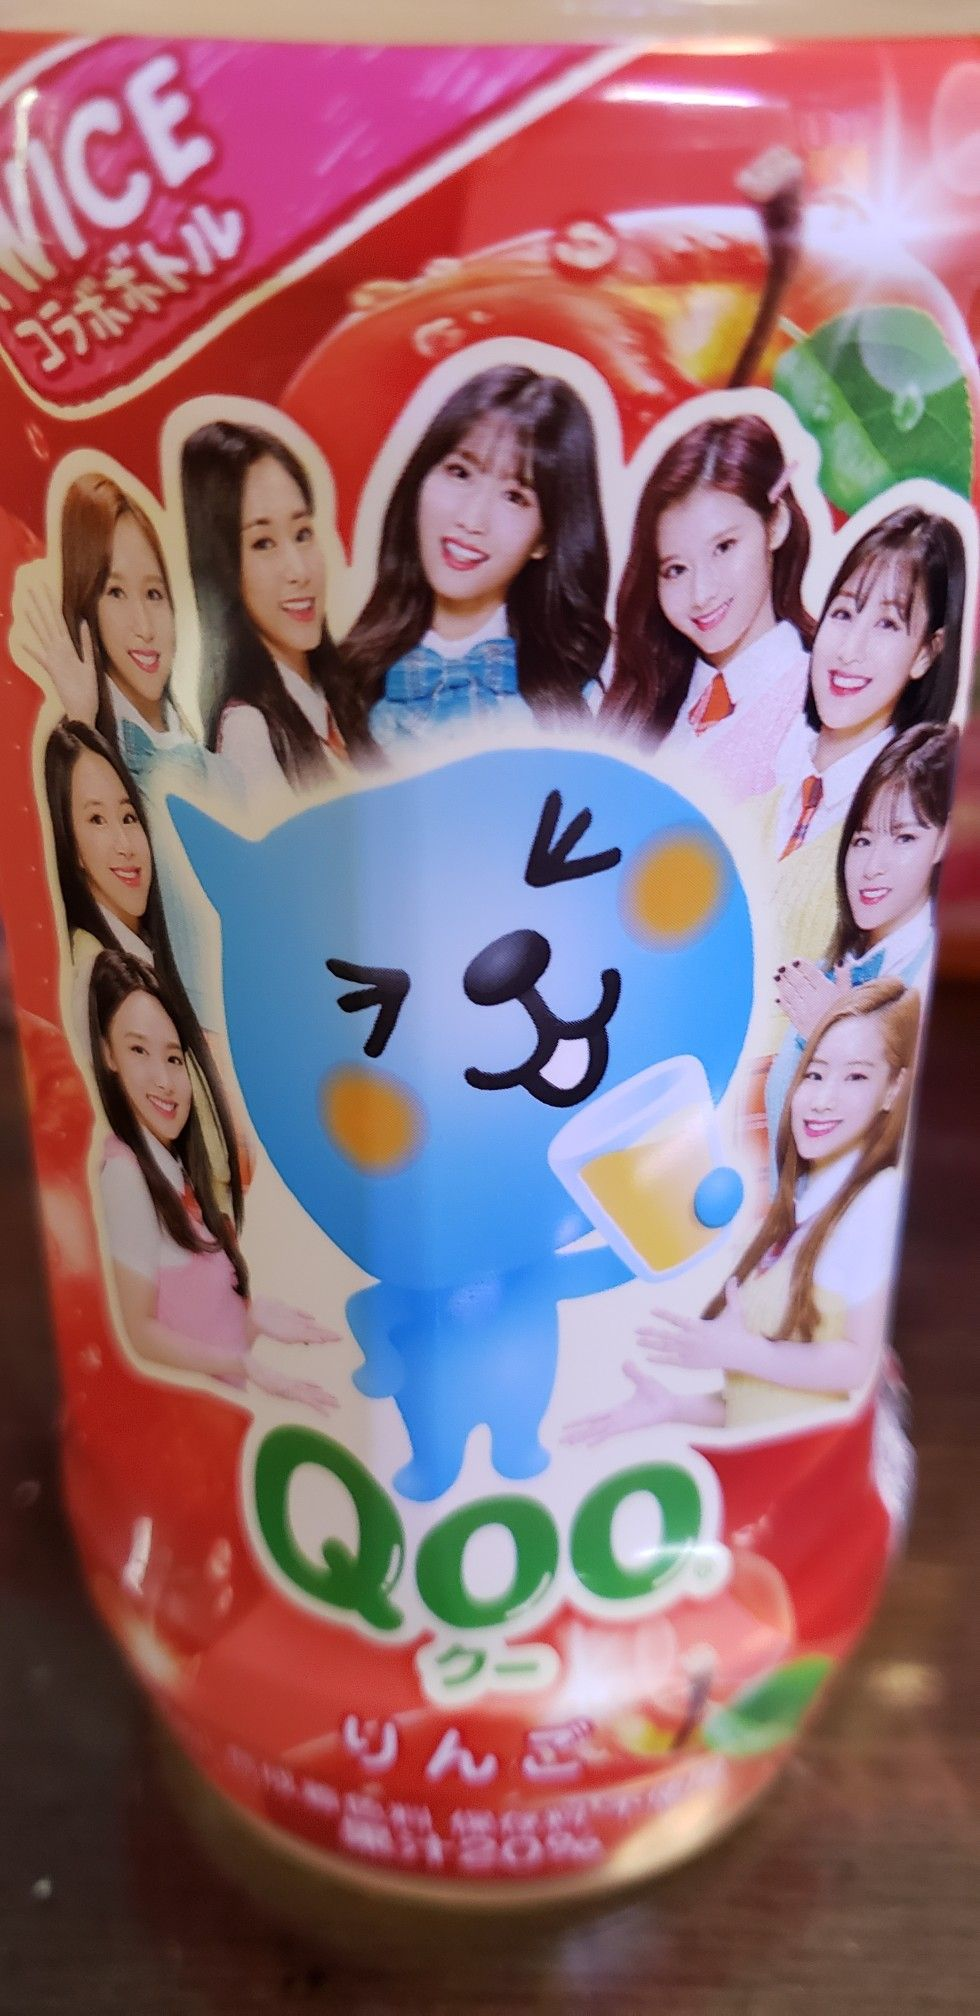 twice メンバー qoo